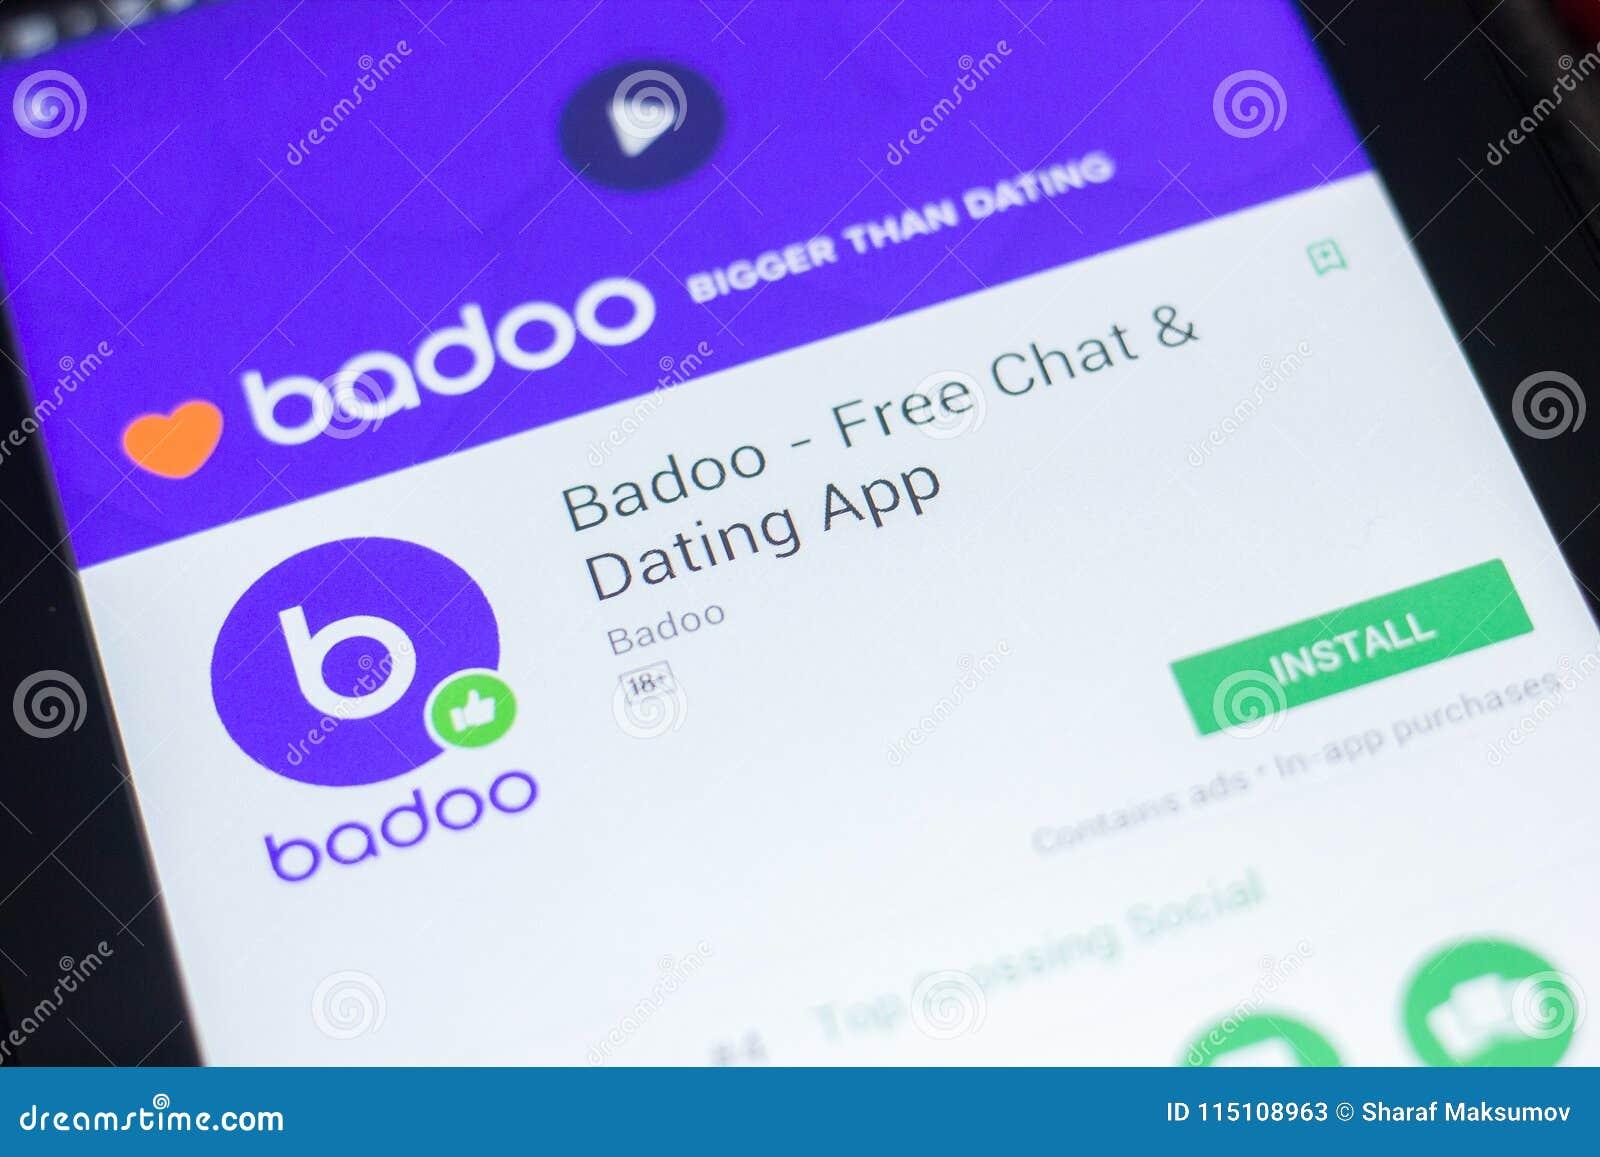 dating παιχνίδια συνομιλίας συντομογραφίες ιστότοπων